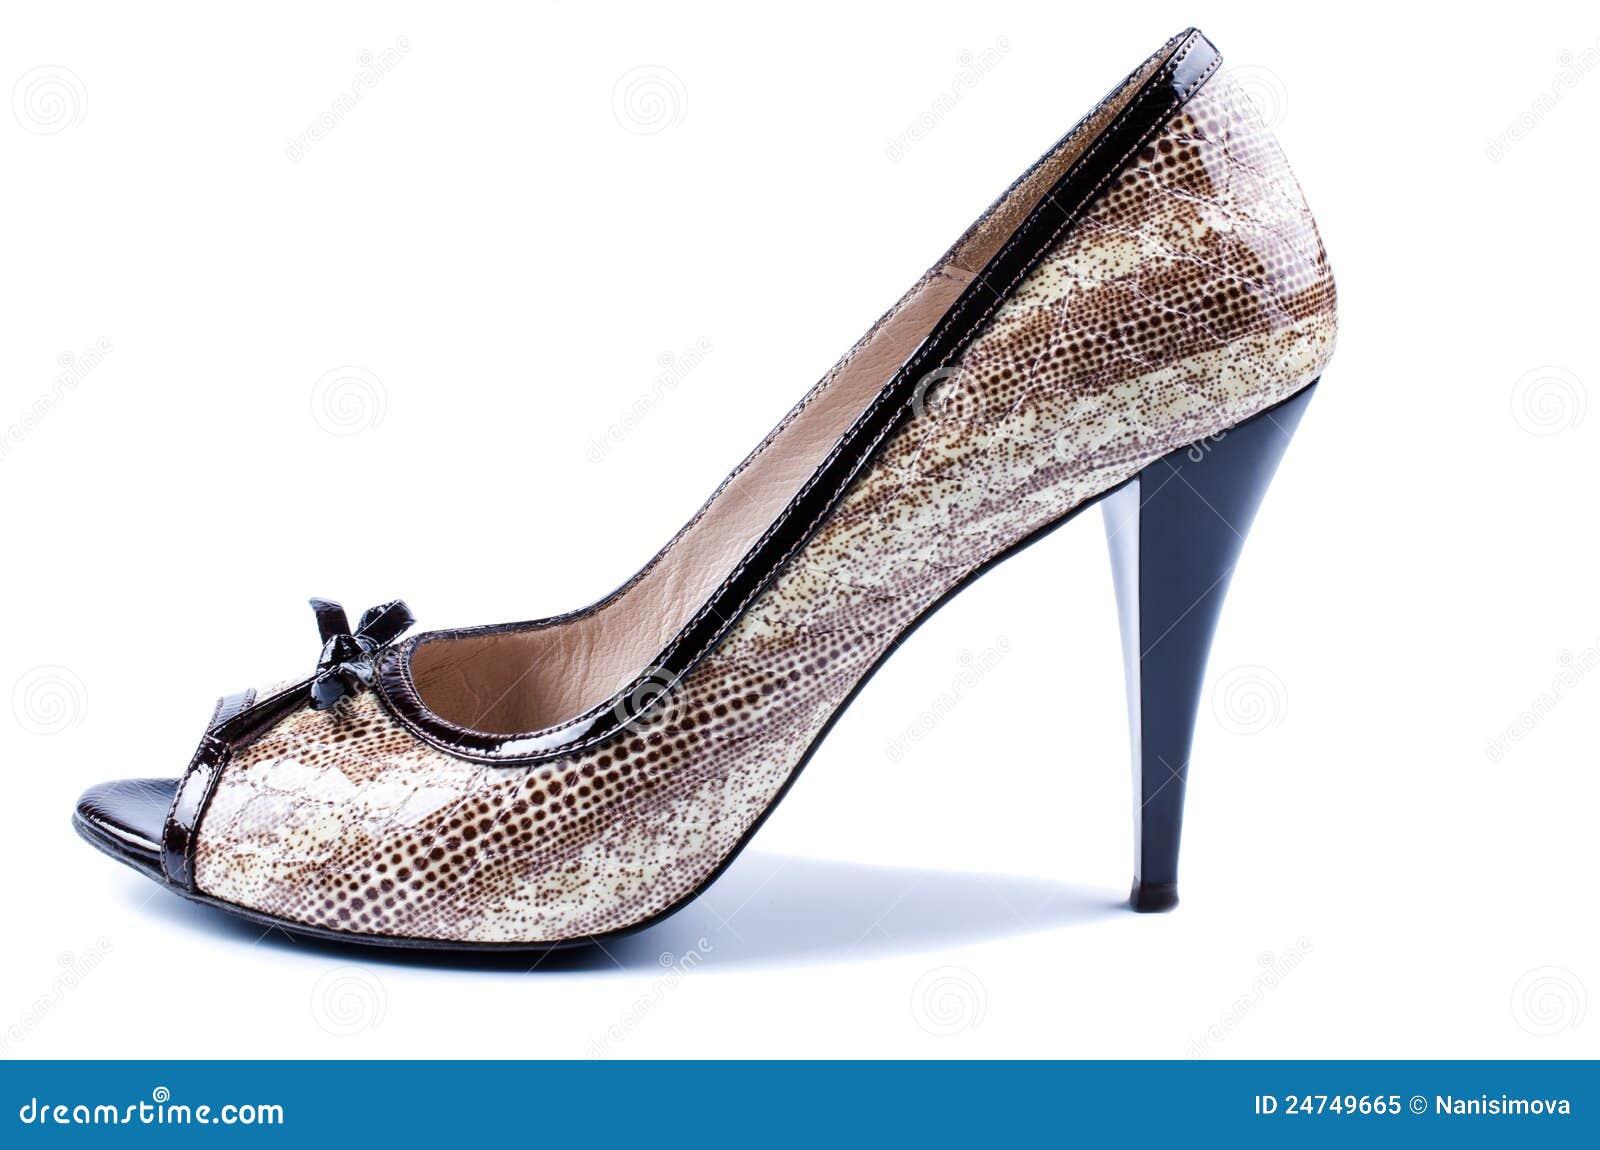 Royalty Free Stock Photo: Elegant brown women s shoes